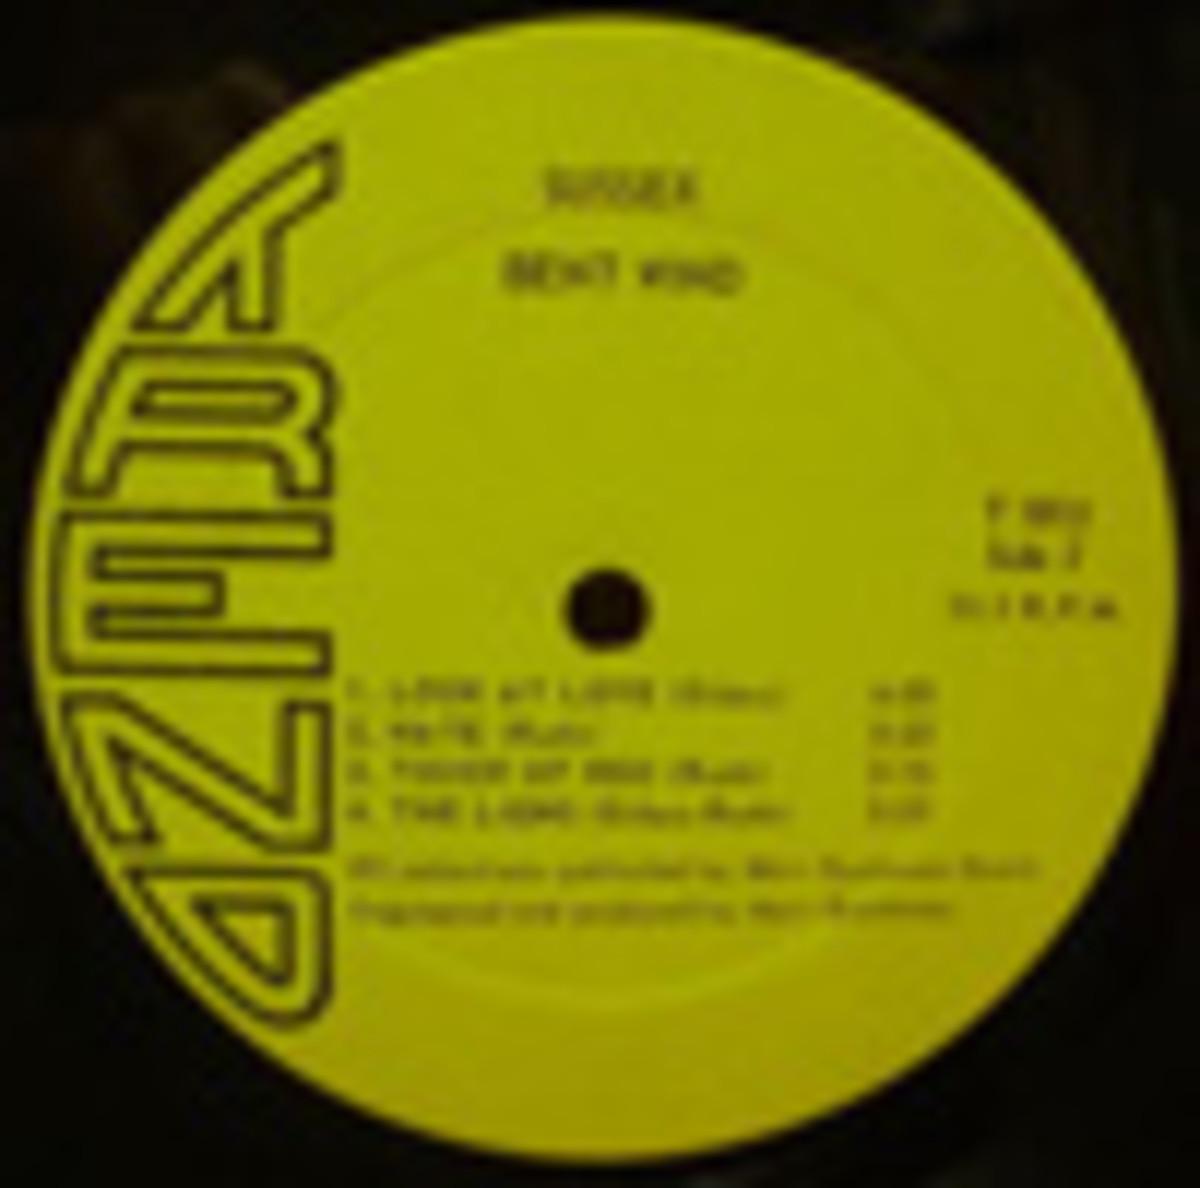 Bent Wind Sussex LP